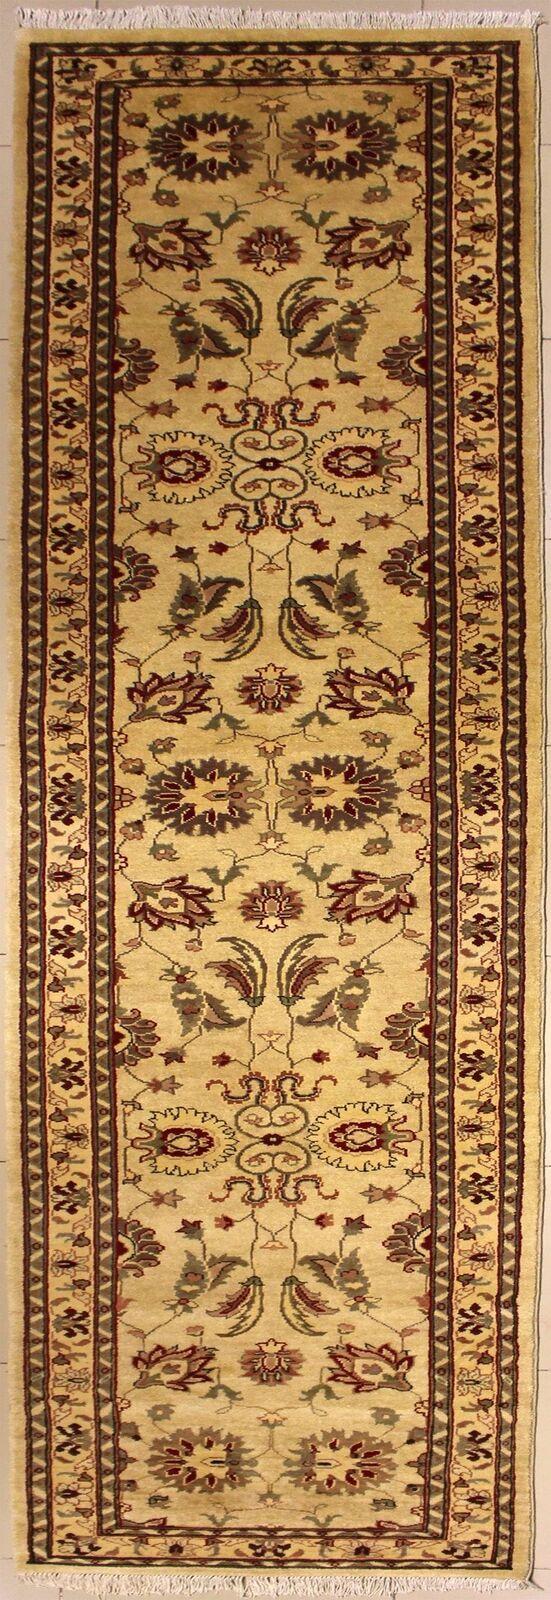 Rugstc 3x10 Senneh Chobi Ziegler Weiß Weiß Weiß Runner Rug,Natural dye,Hand-Knotted,Wool 61624e